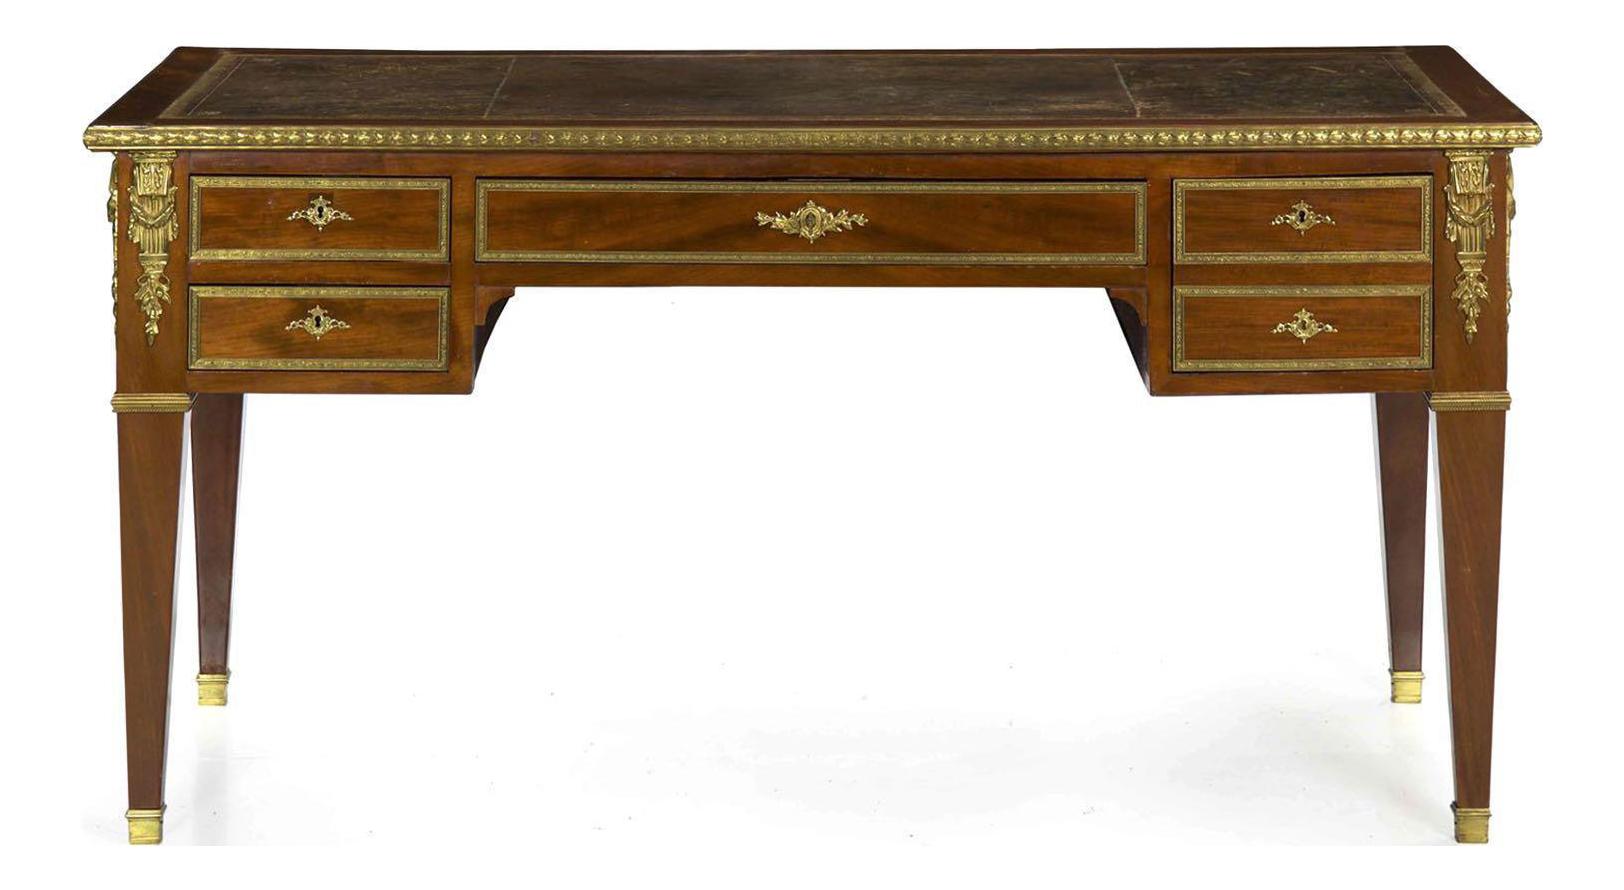 French Neoclassical Antique Writing Desk Bureau Plat, 19th Century